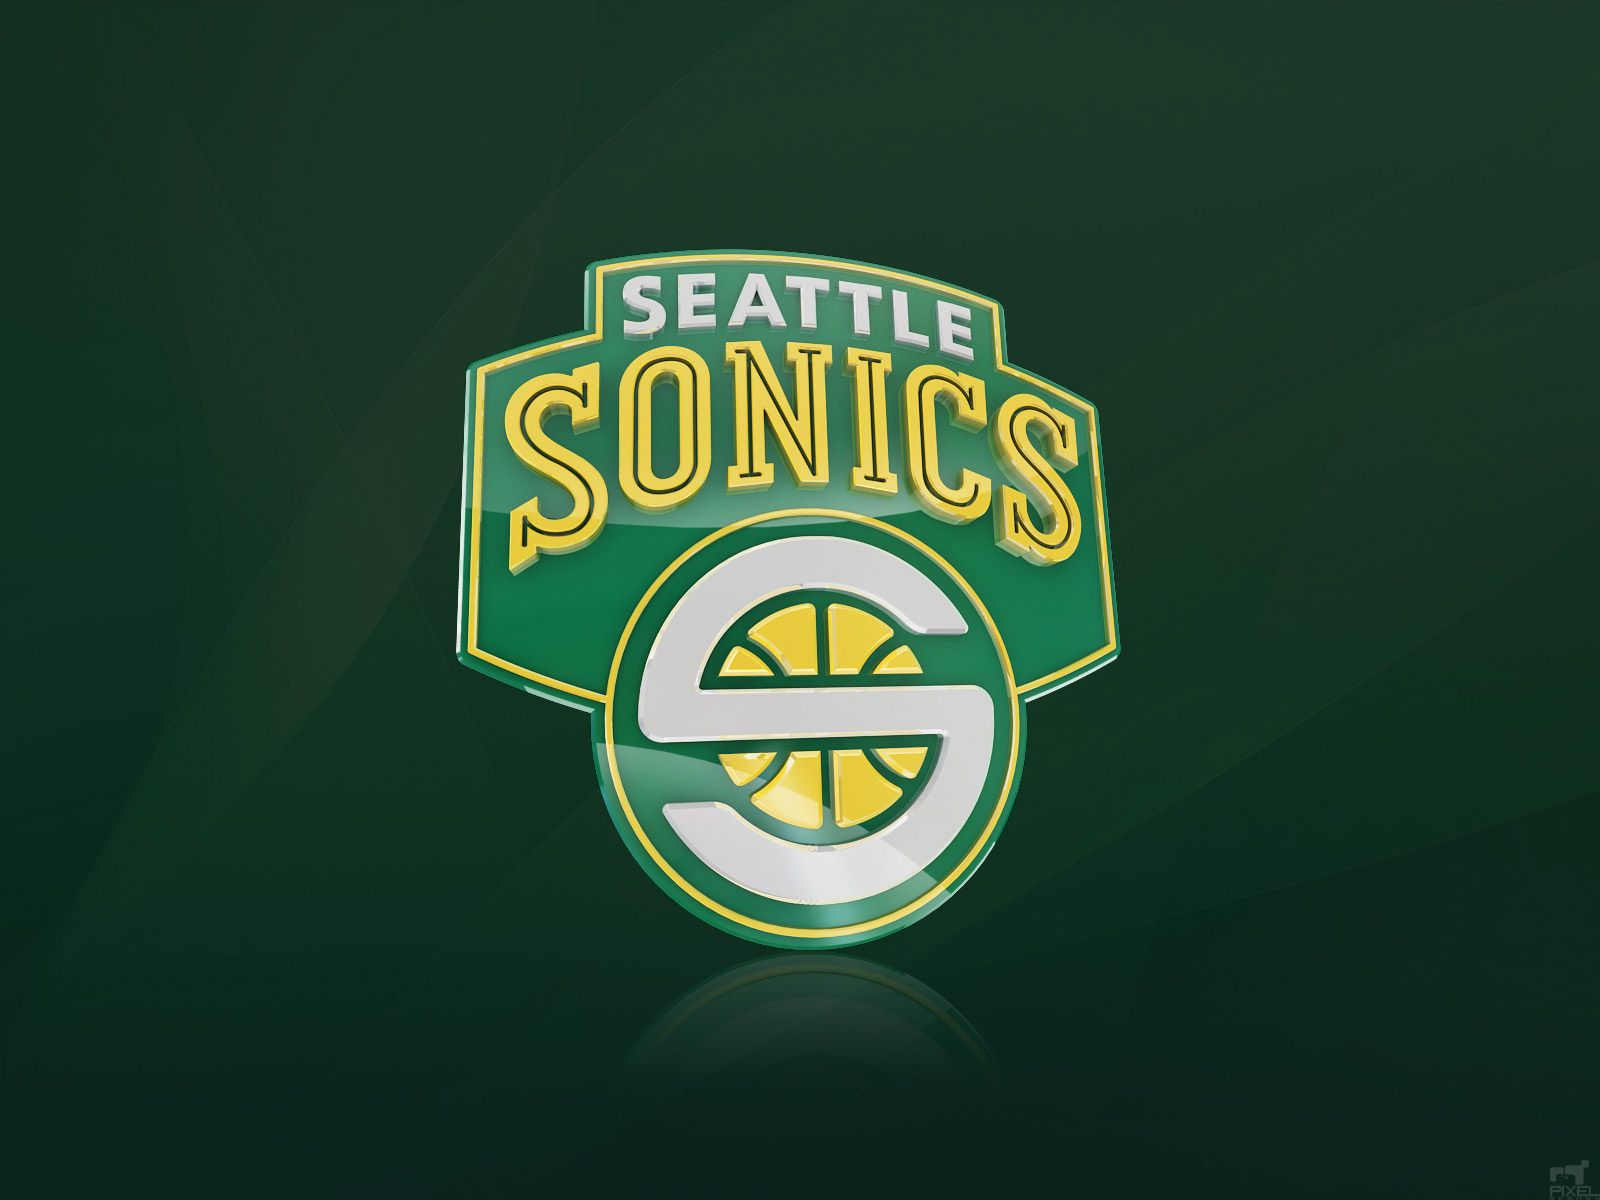 Sonics Nba Wallpapers Sports Team Logos Nba